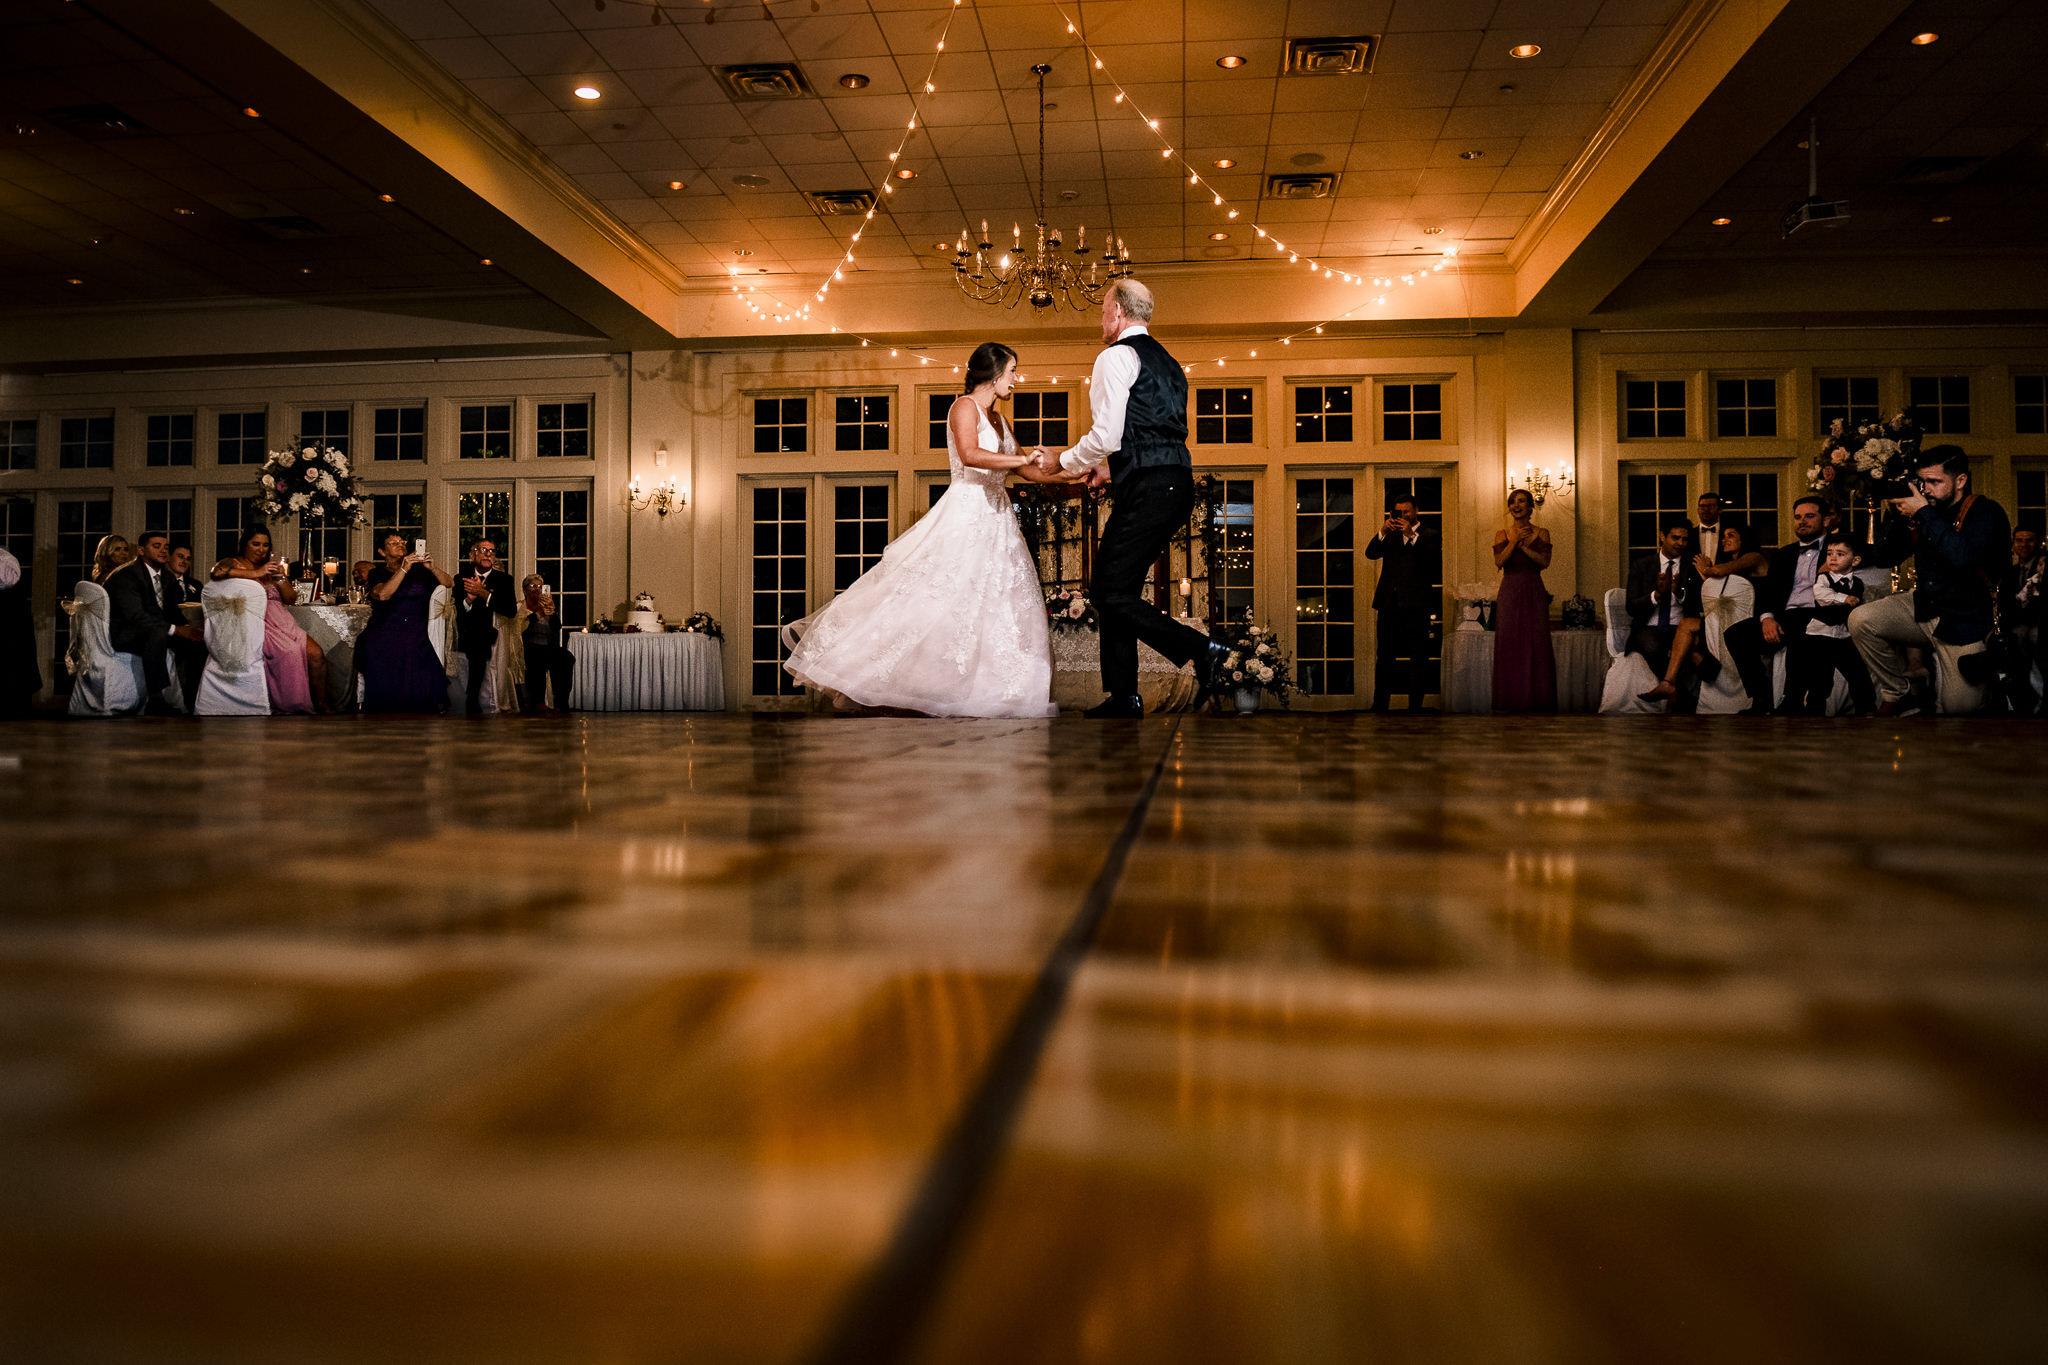 Coyle-Forsgate-Country-Club-Wedding-Photographer-44.JPG